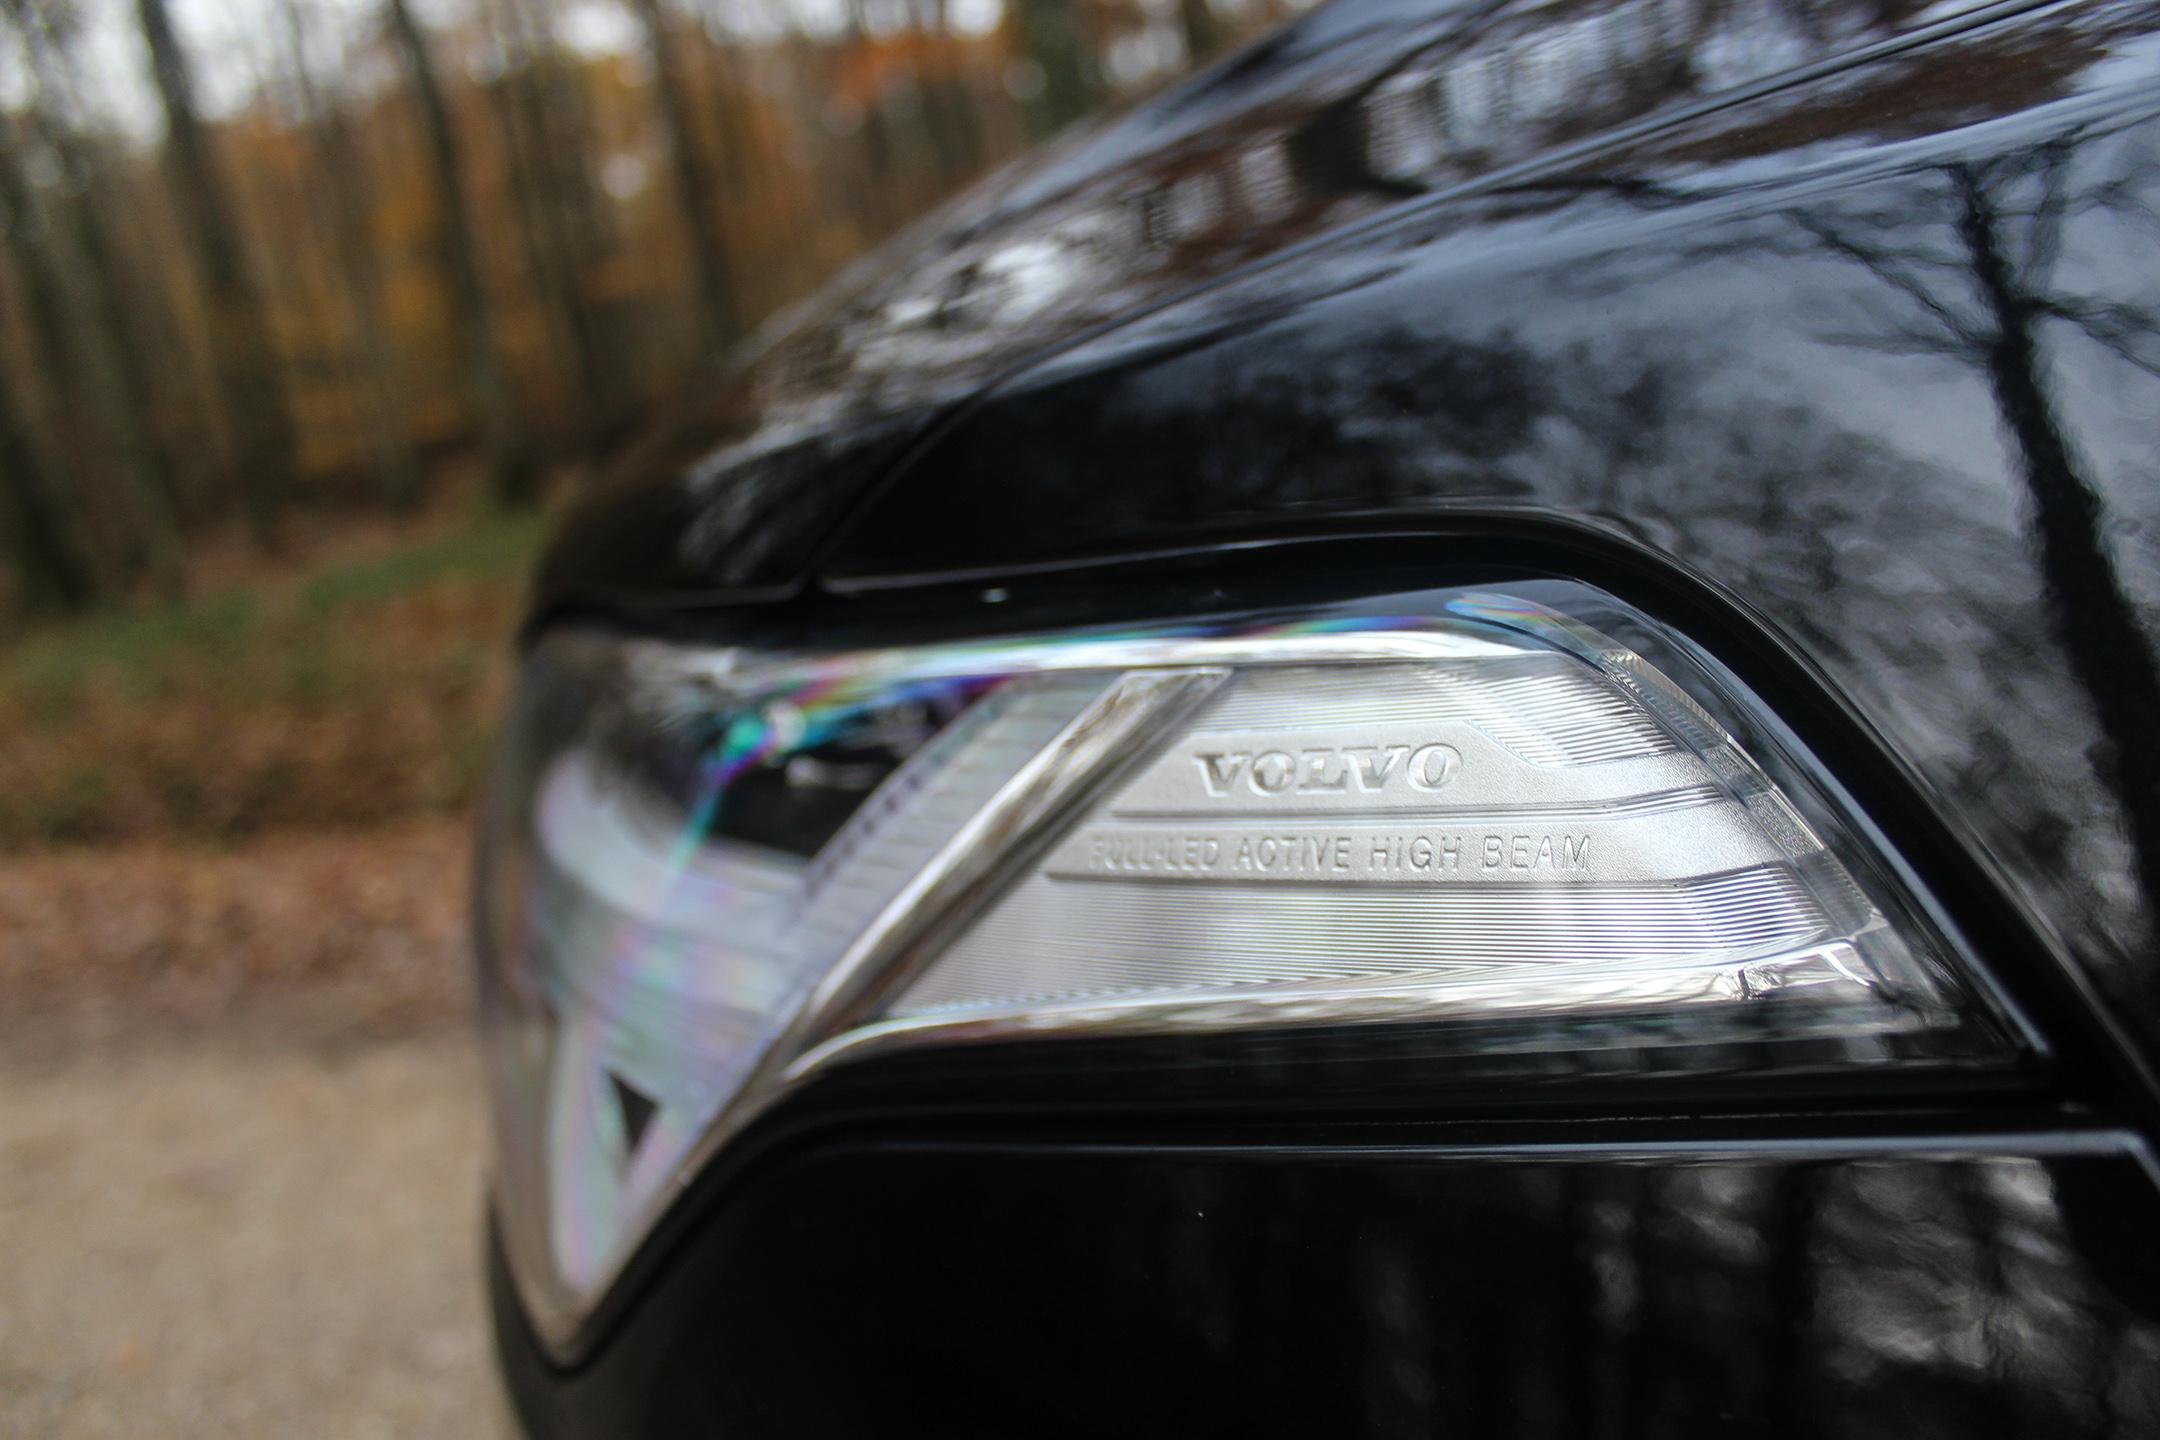 volvoXC90T8Hybrid43-volvo-XC90-T8-Hybrid-headlight-phare-arnaud-demasier-rsphotographie